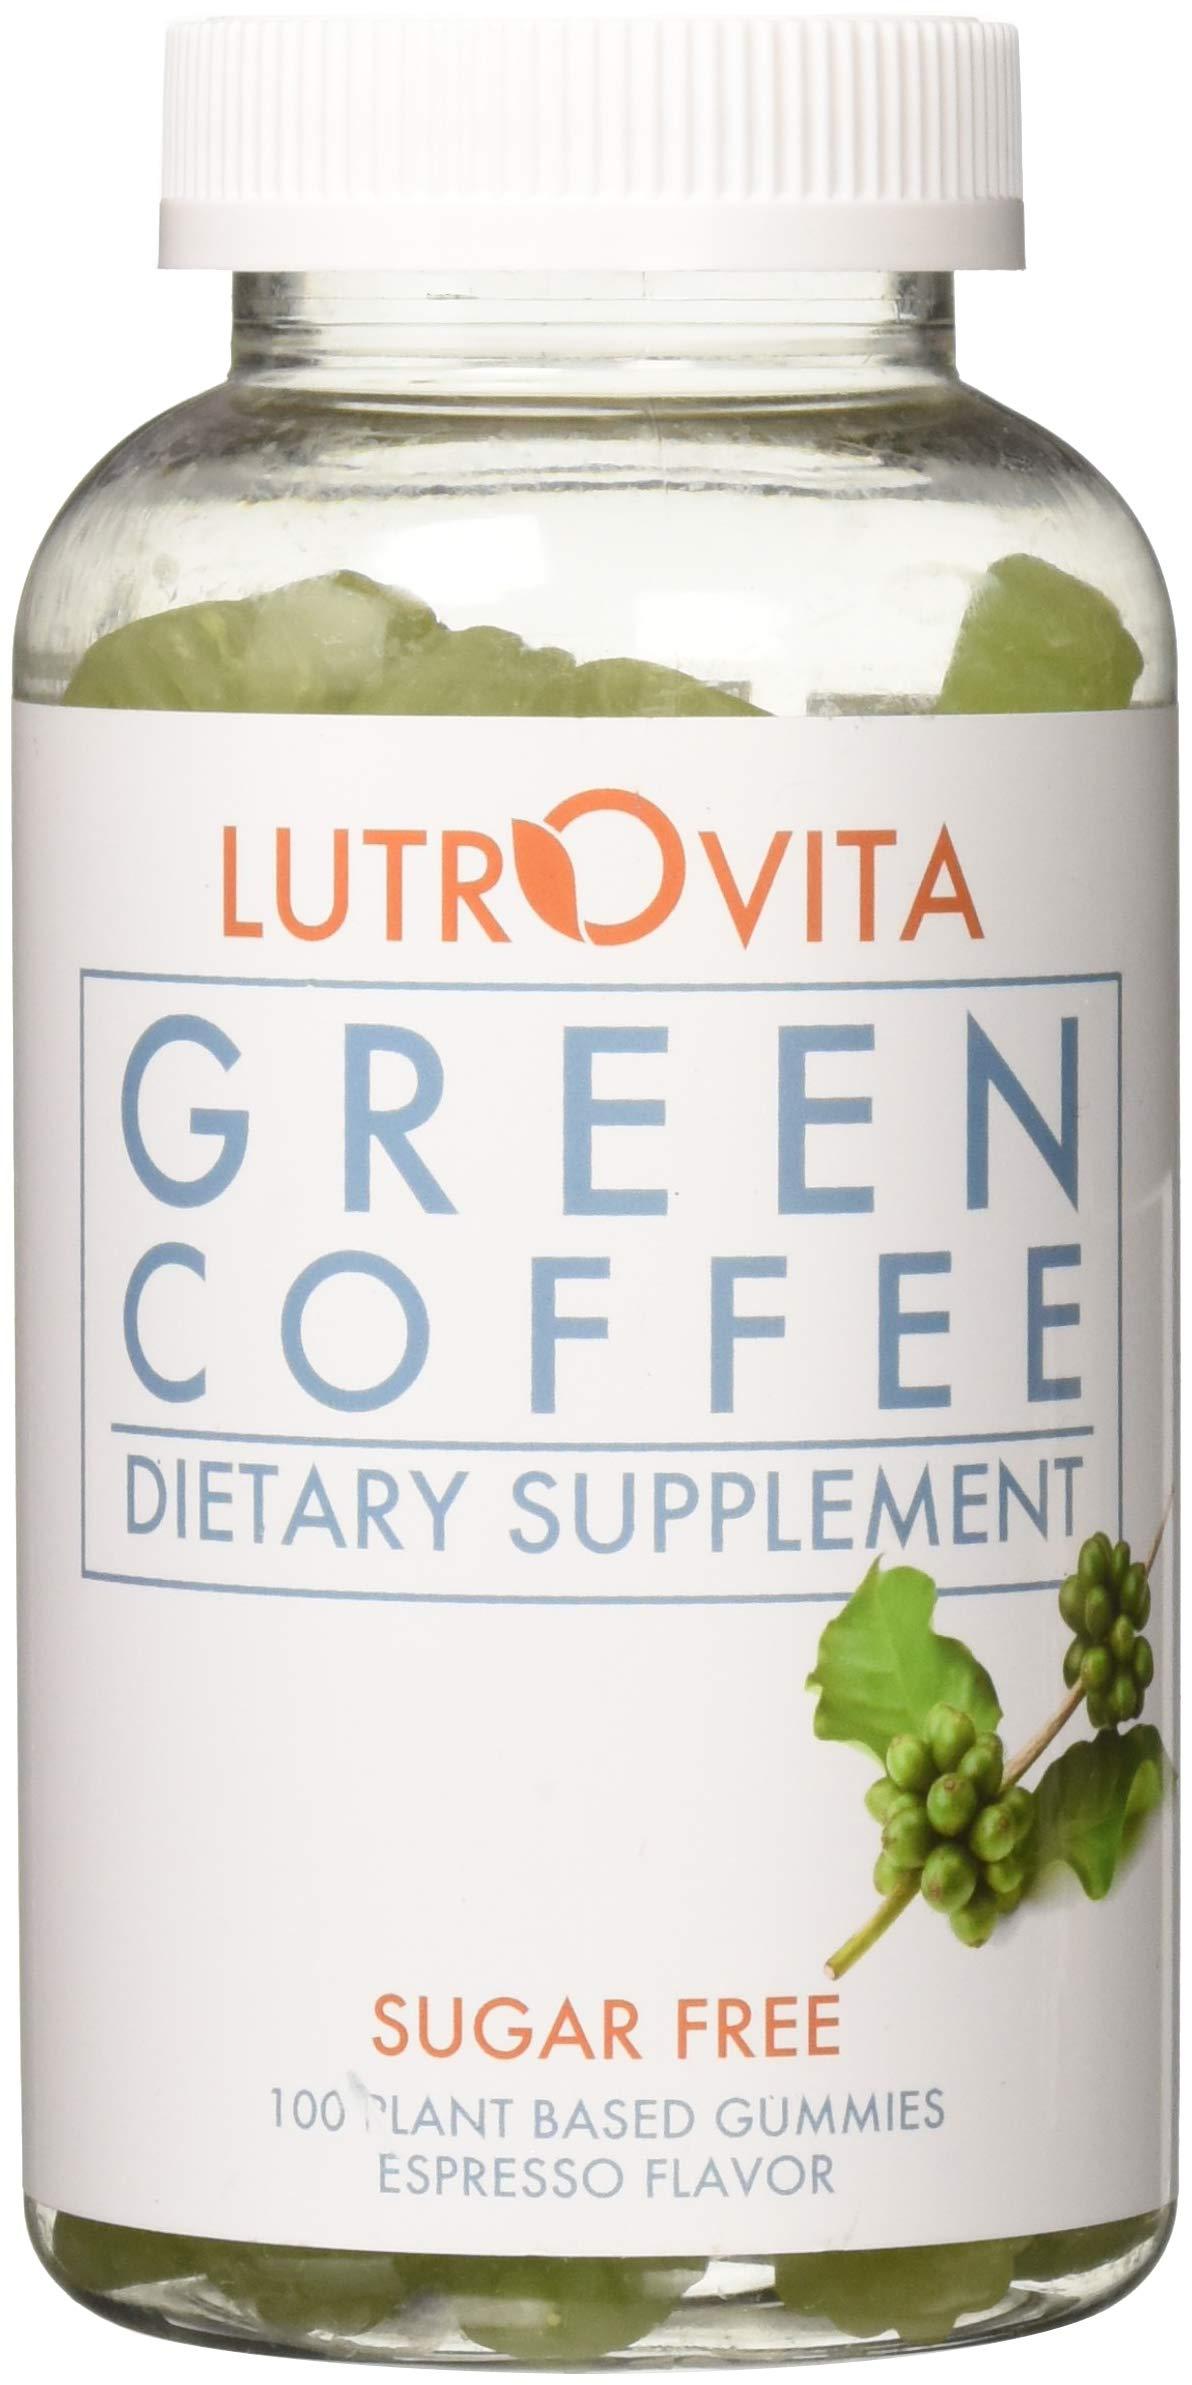 Lutrovita Sugar Free Green Coffee Gummy, Expresso, 100 Count